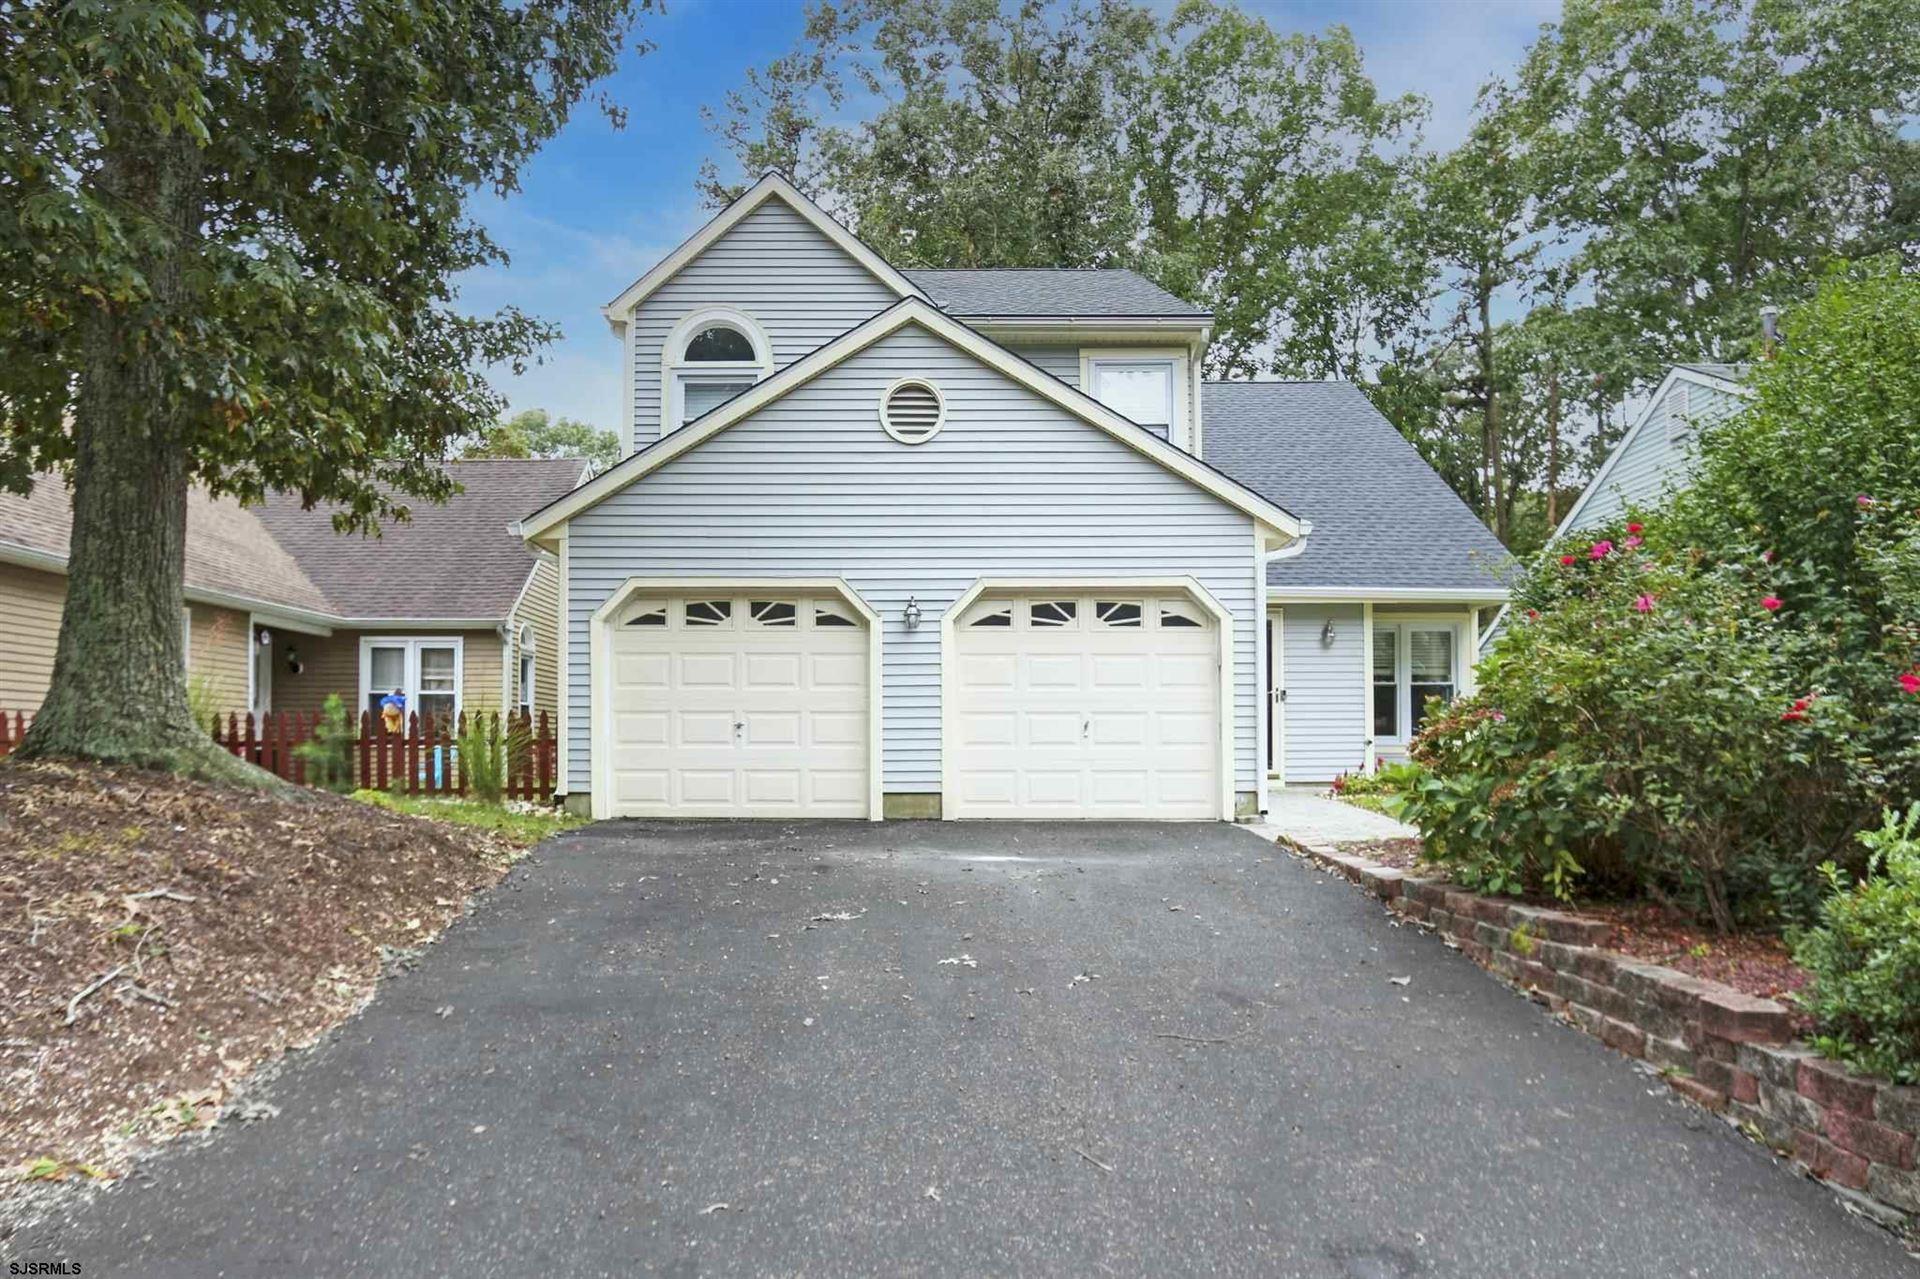 728 Whalers Cove, Smithville, NJ 08205 - #: 556476